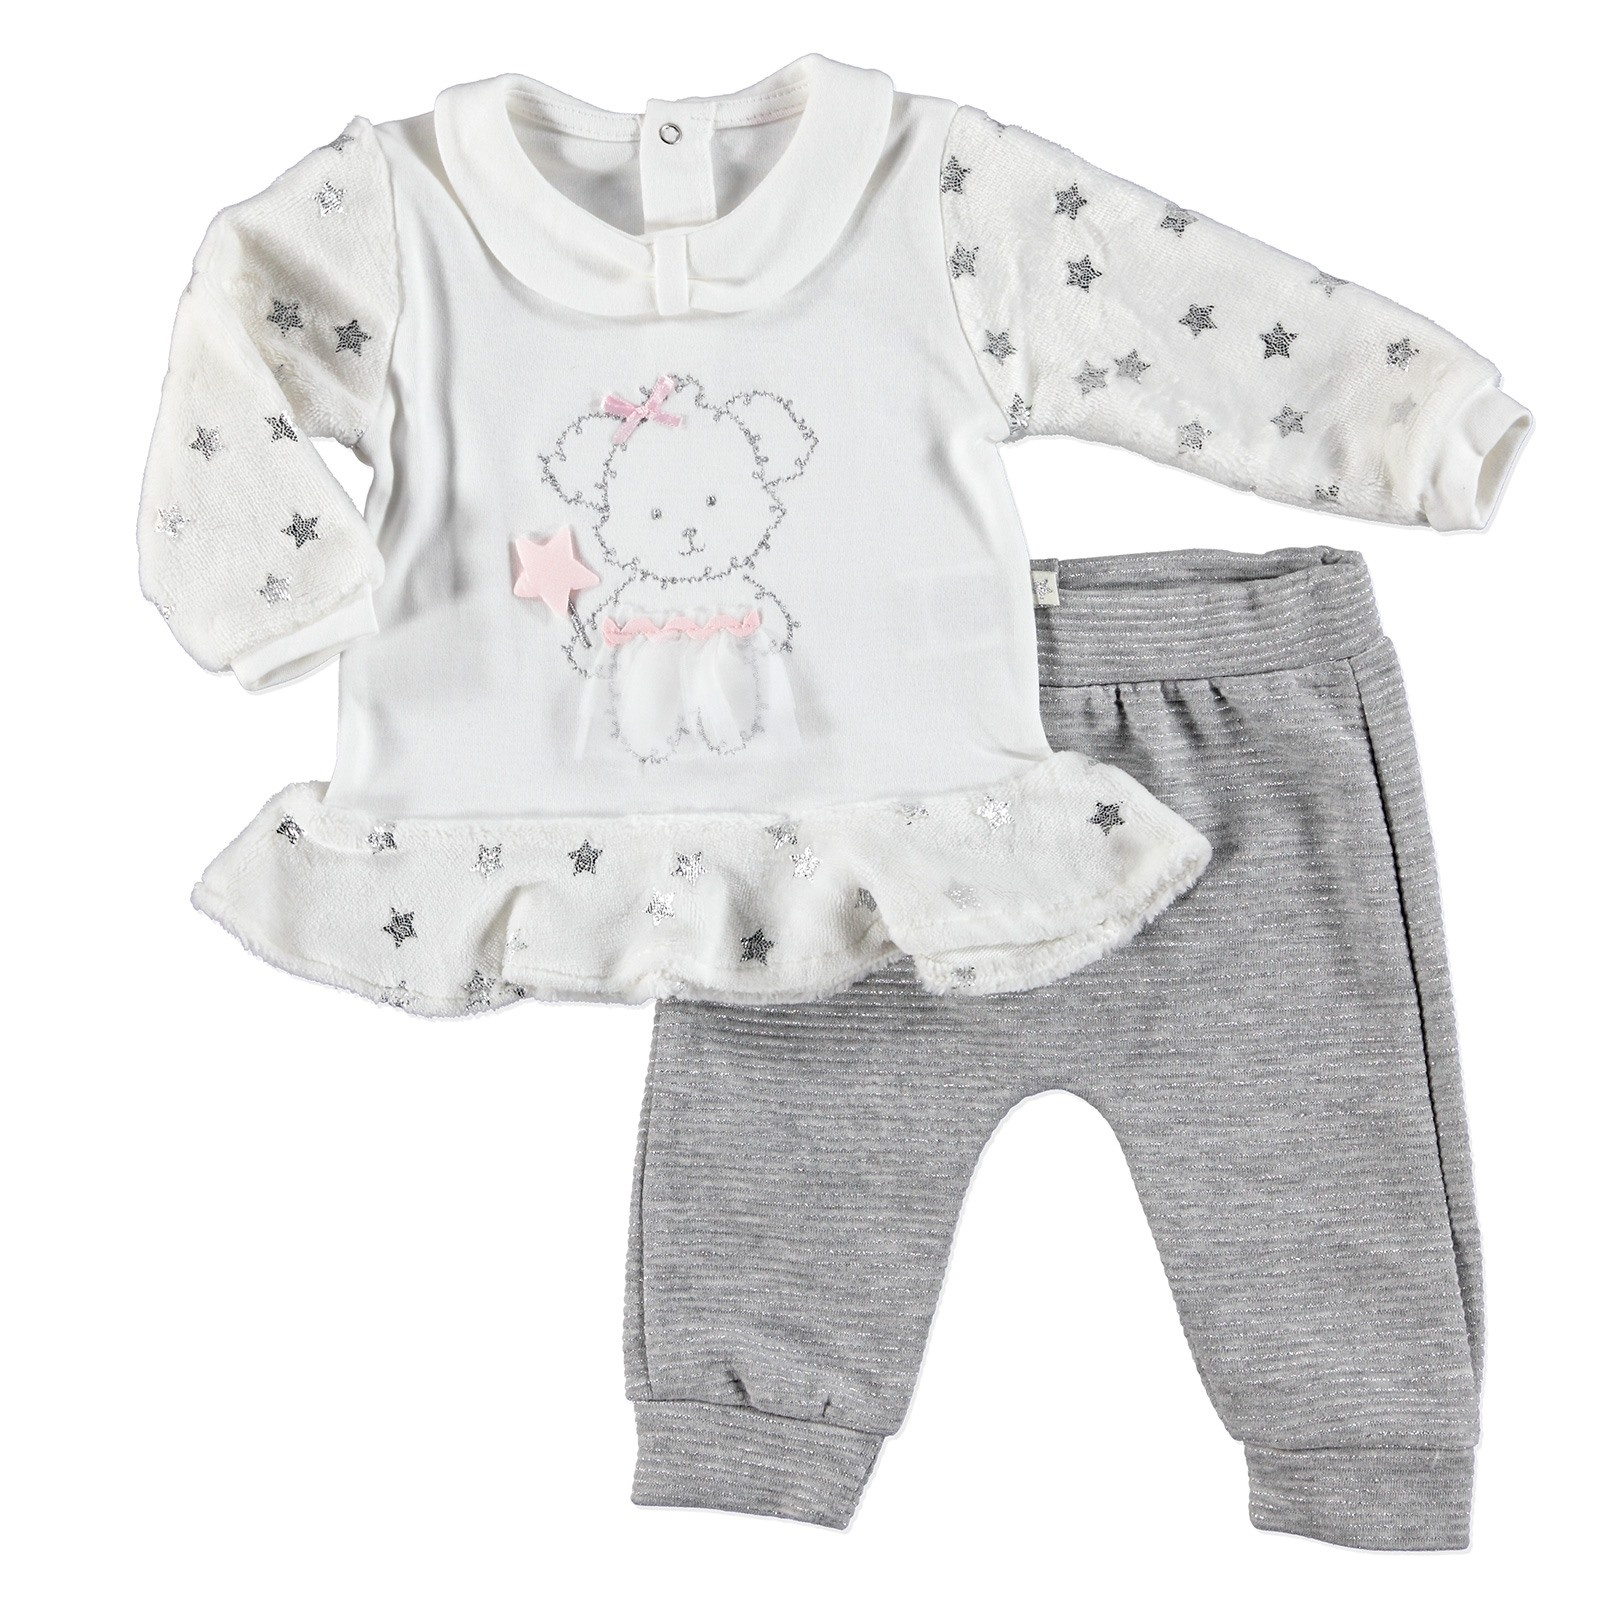 Ebebek Mymio Star Baby Girl Velvet Sweatshirt Trousers Set 2 Pcs